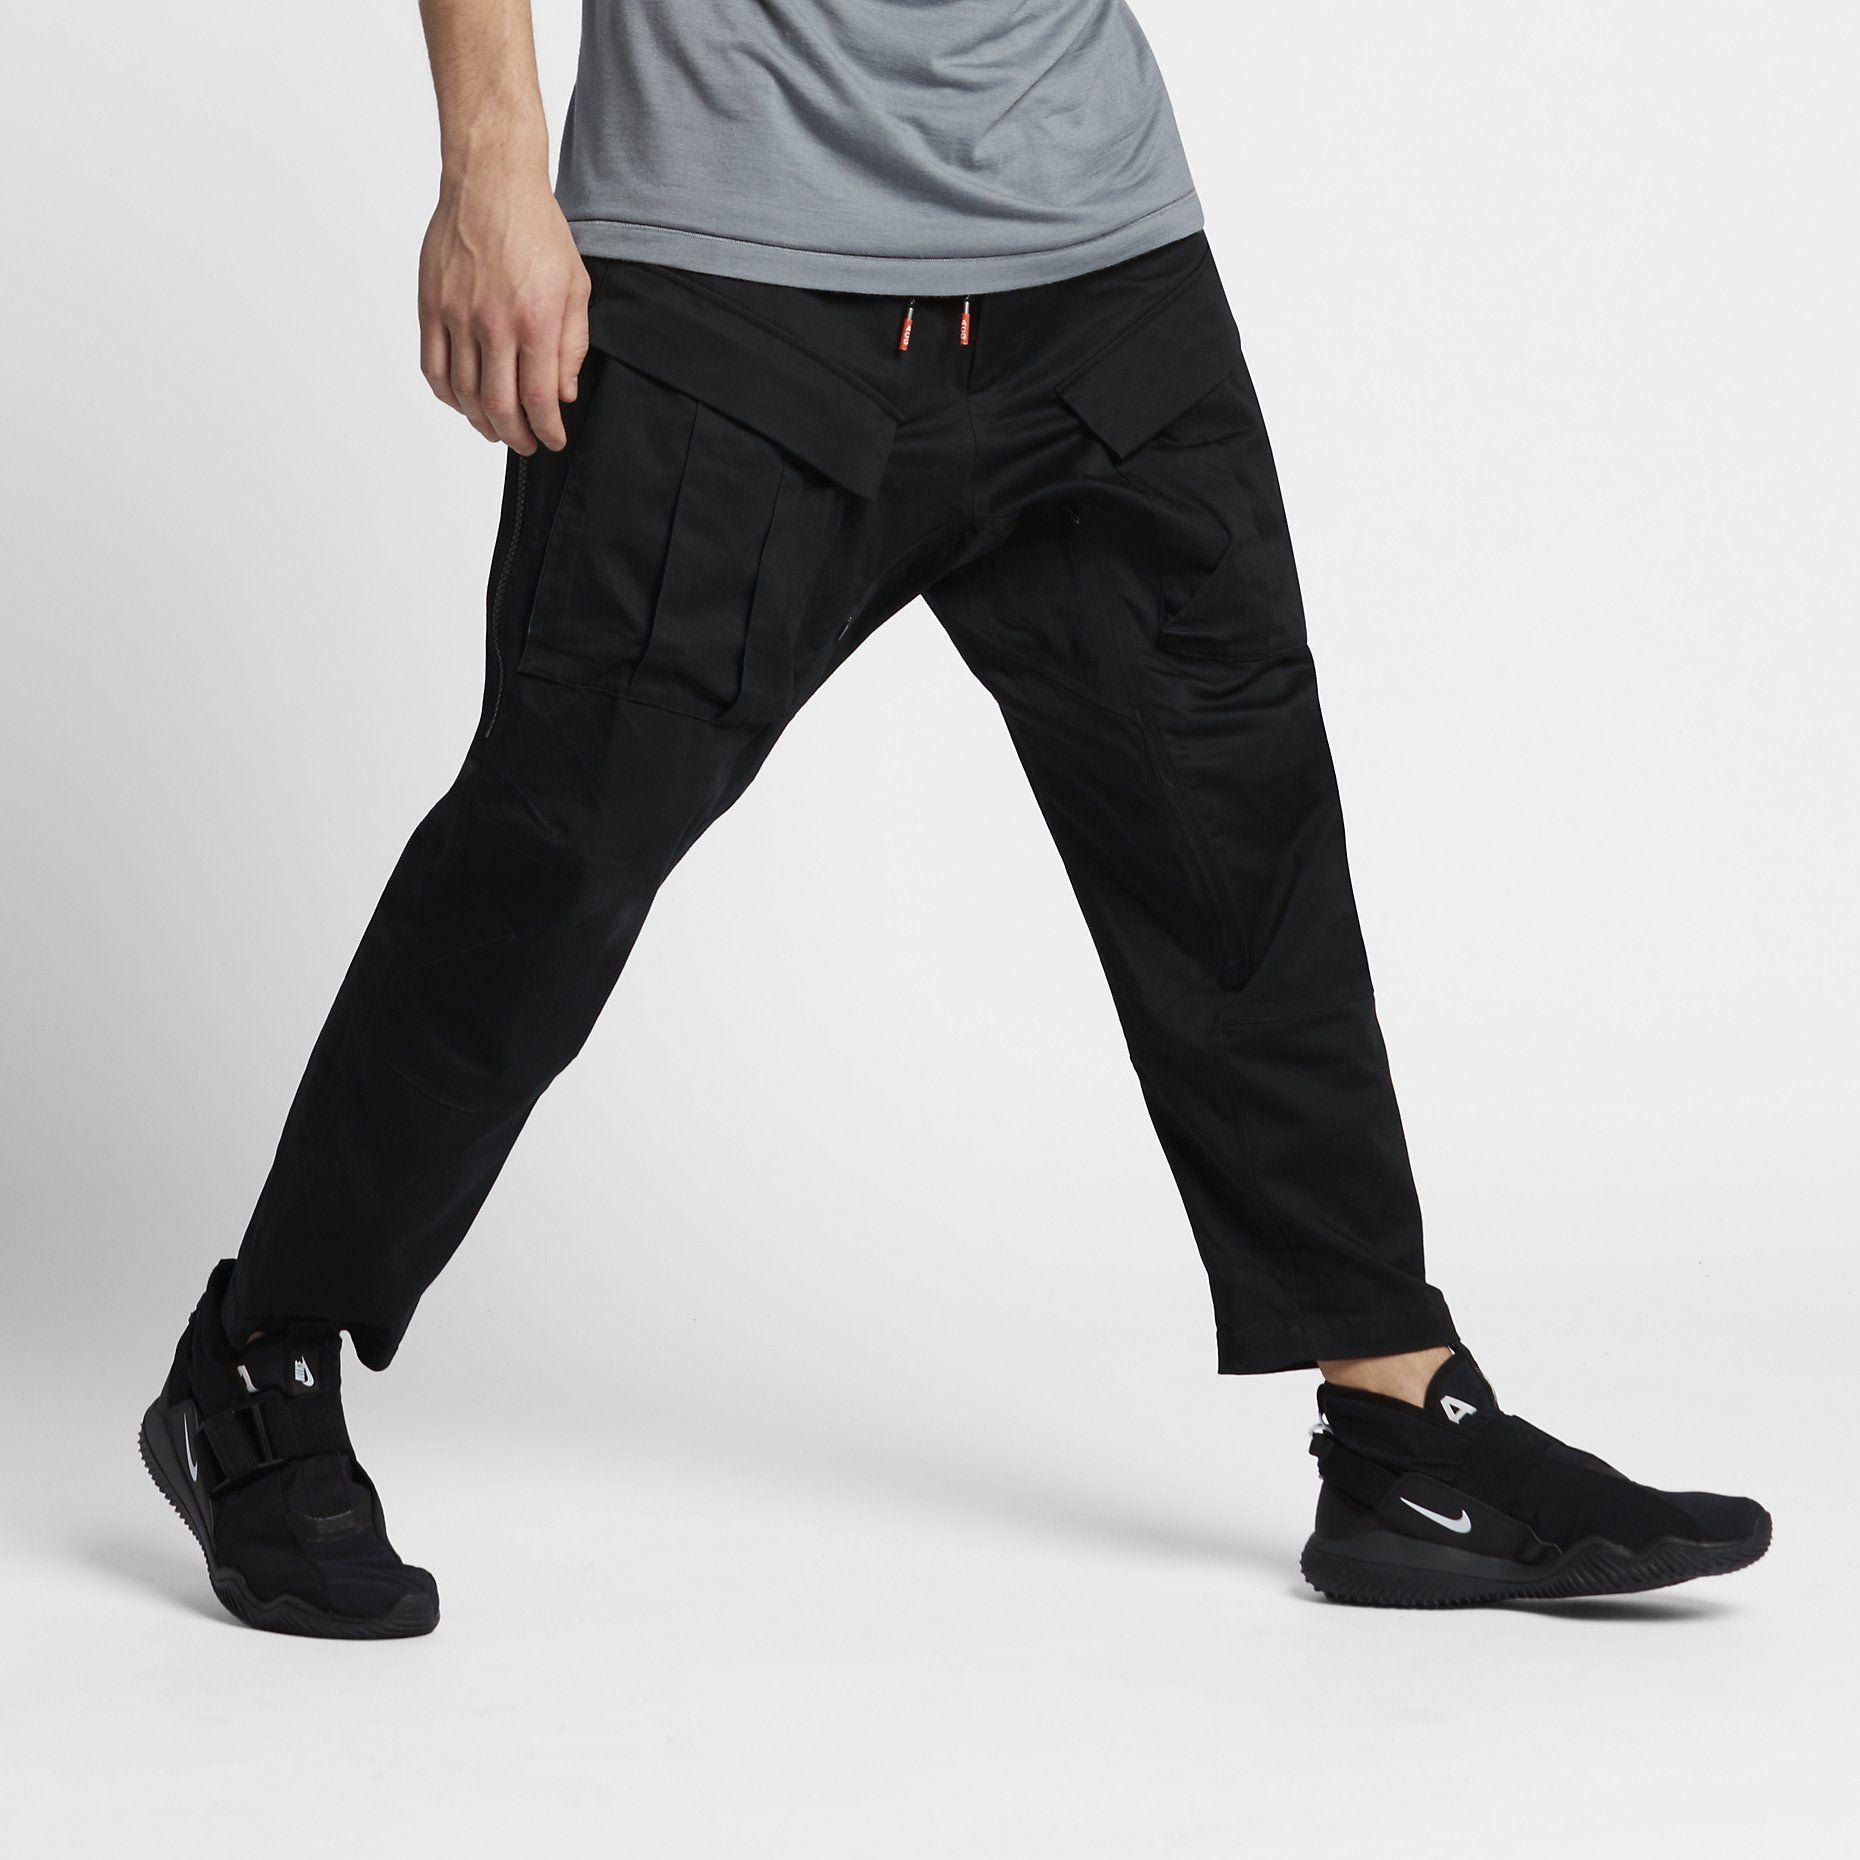 abbigliamento uomo nike 2017